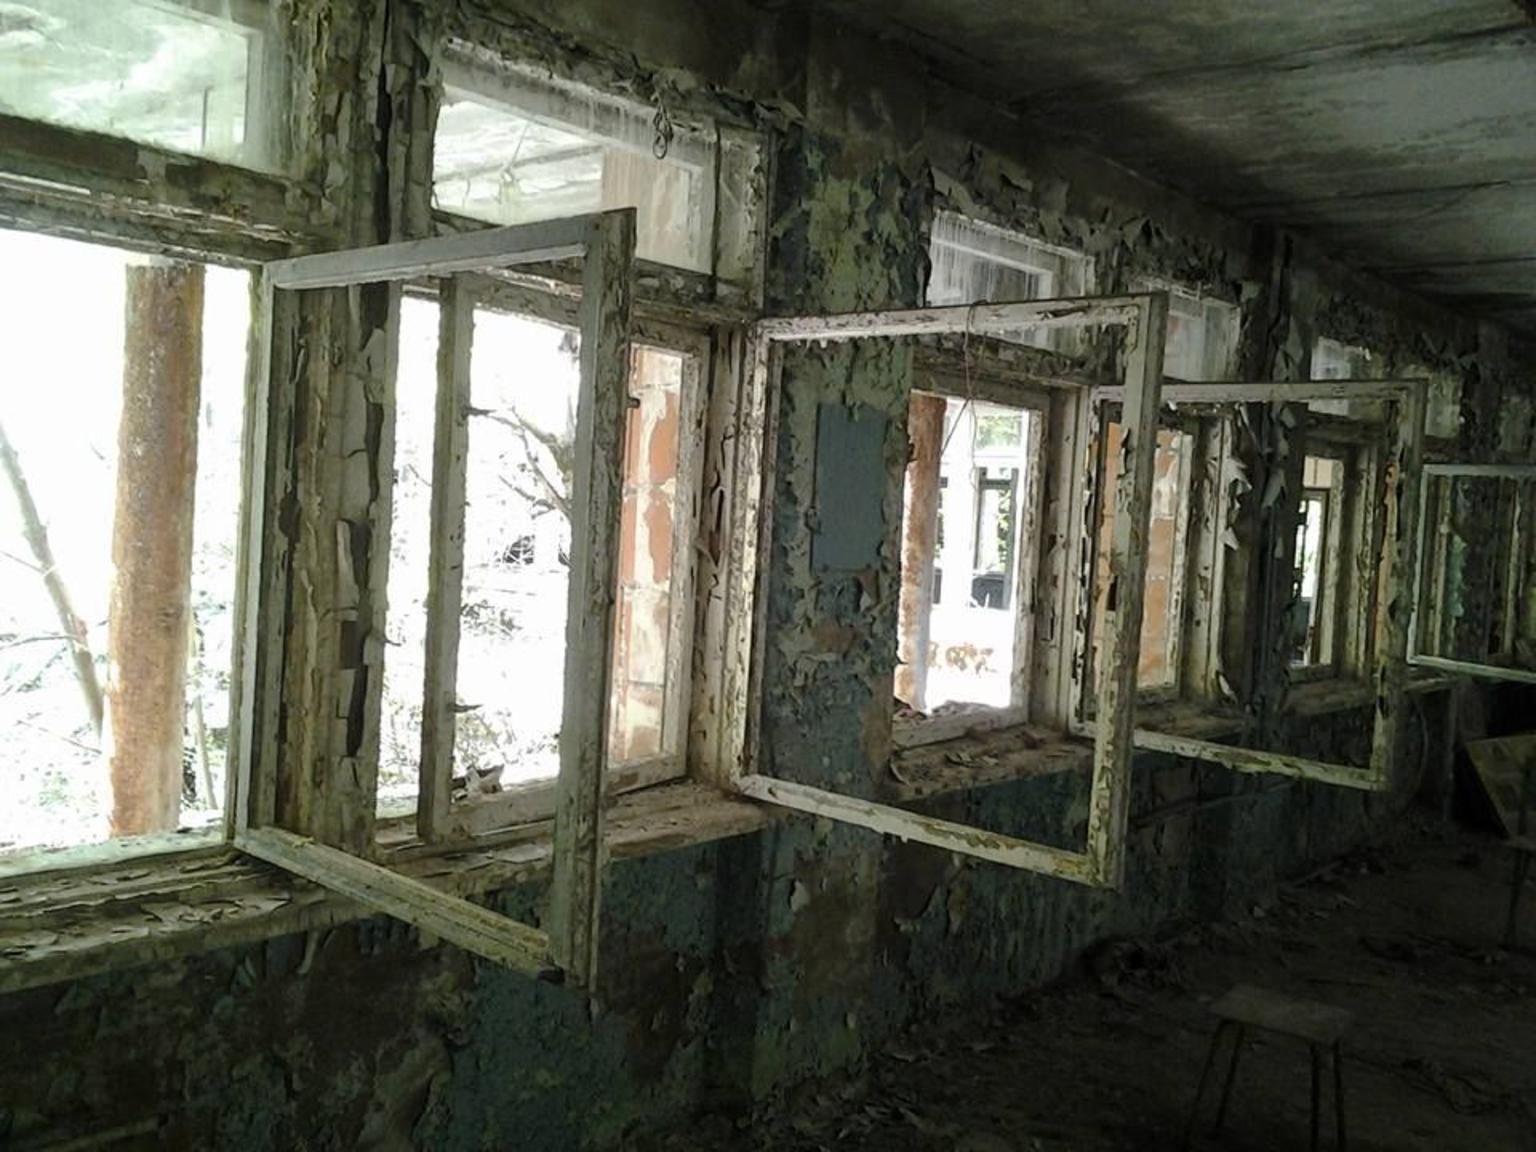 MÁS FOTOS, Excursión a Chernóbil desde Kiev